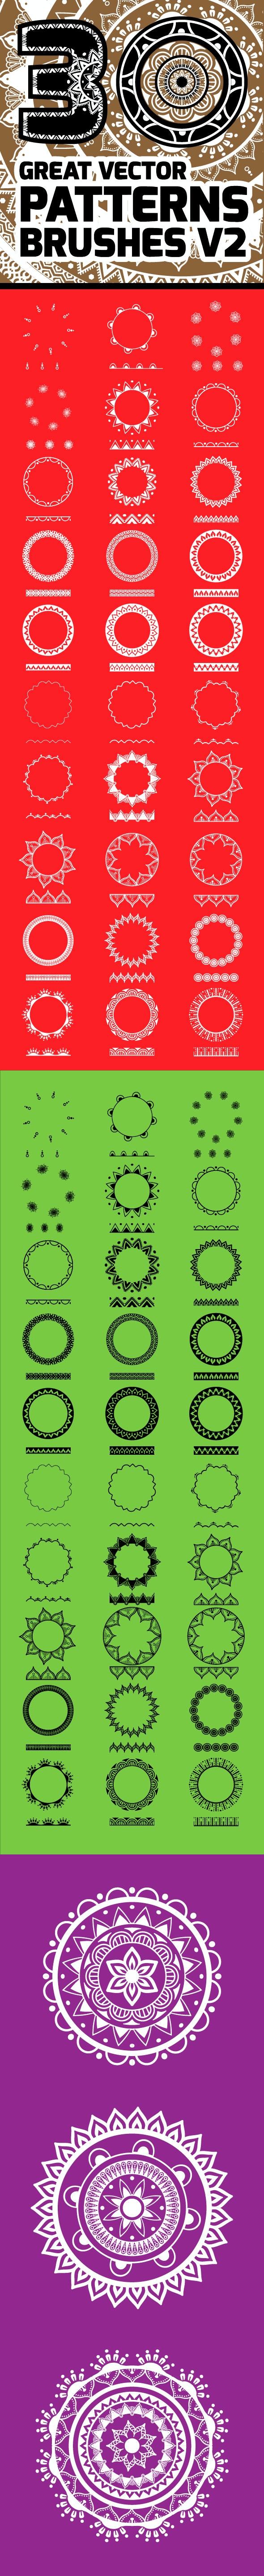 30 Grat Vector Patterns Brushes V2 - Miscellaneous Brushes